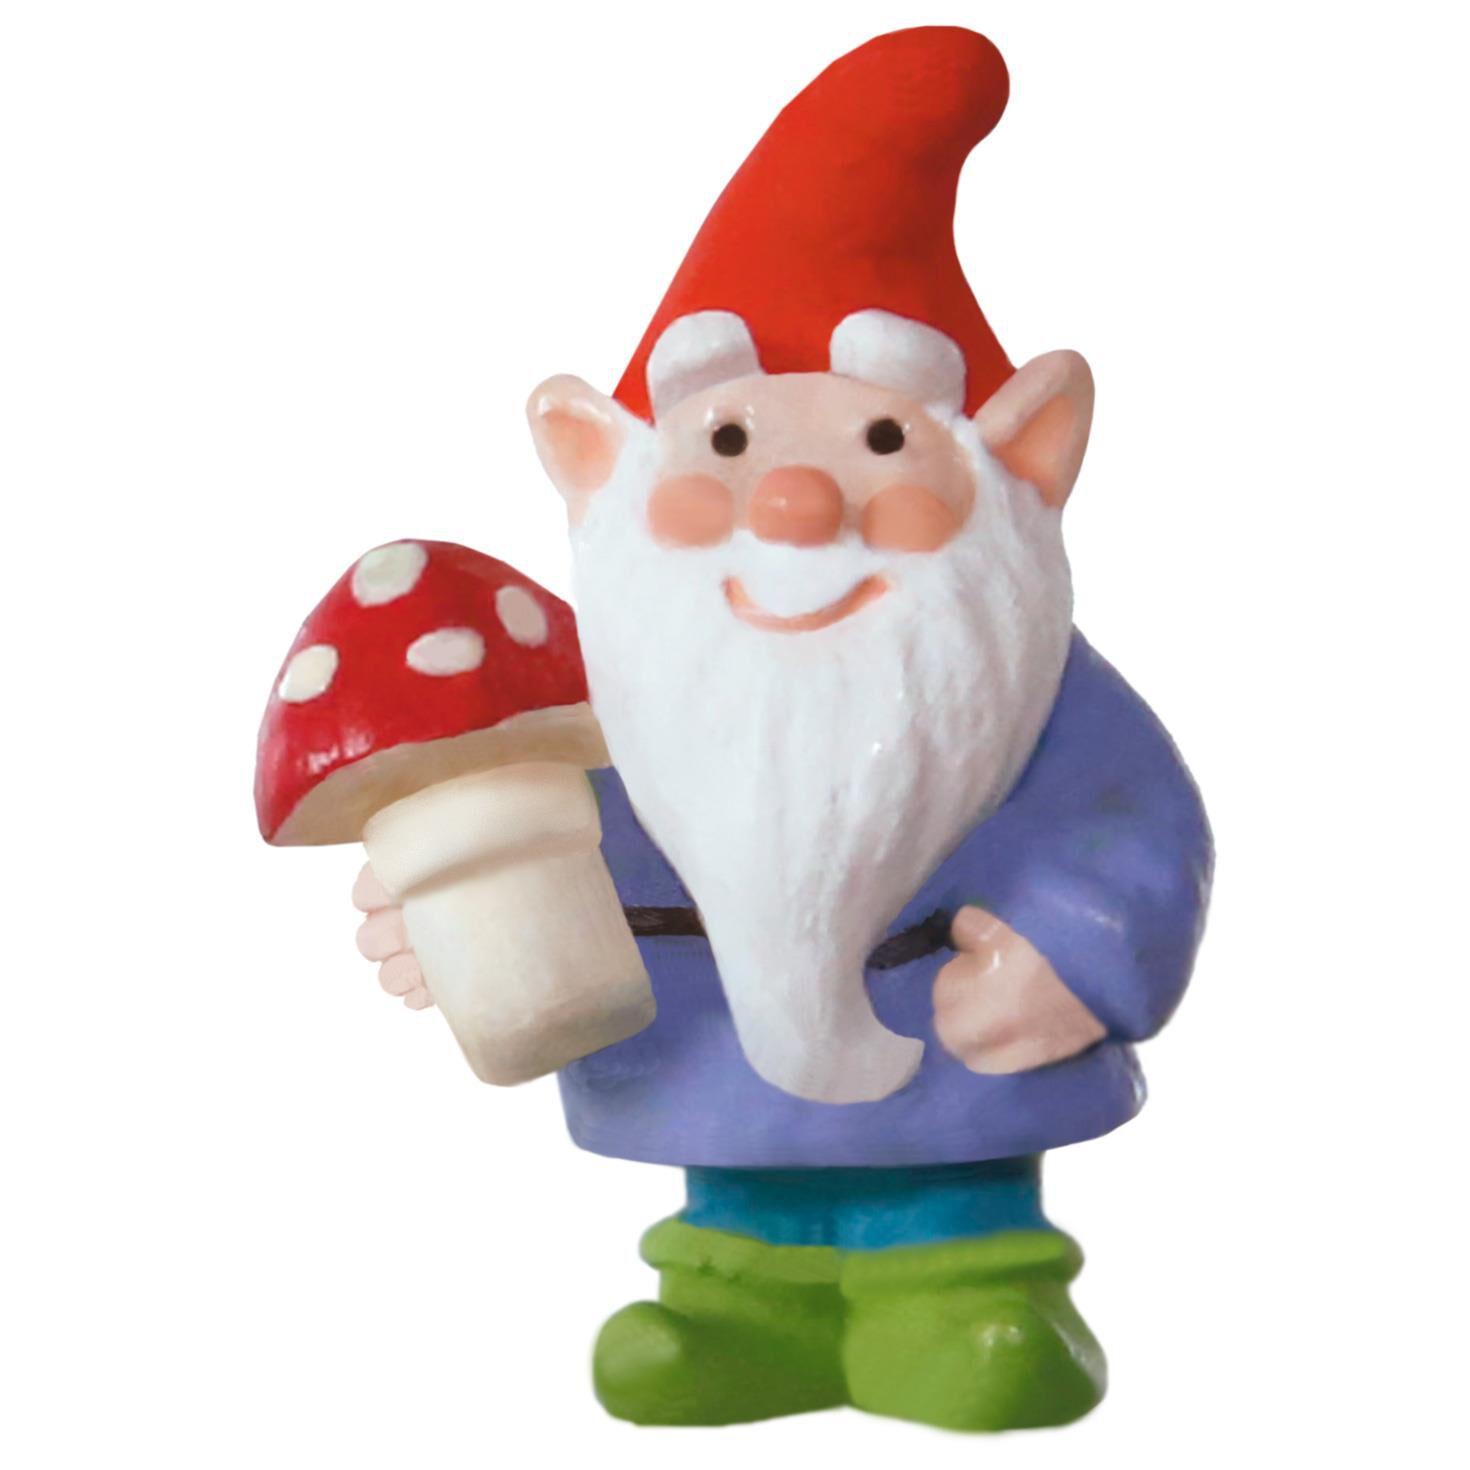 wee little gnome mini ornament keepsake ornaments hallmark